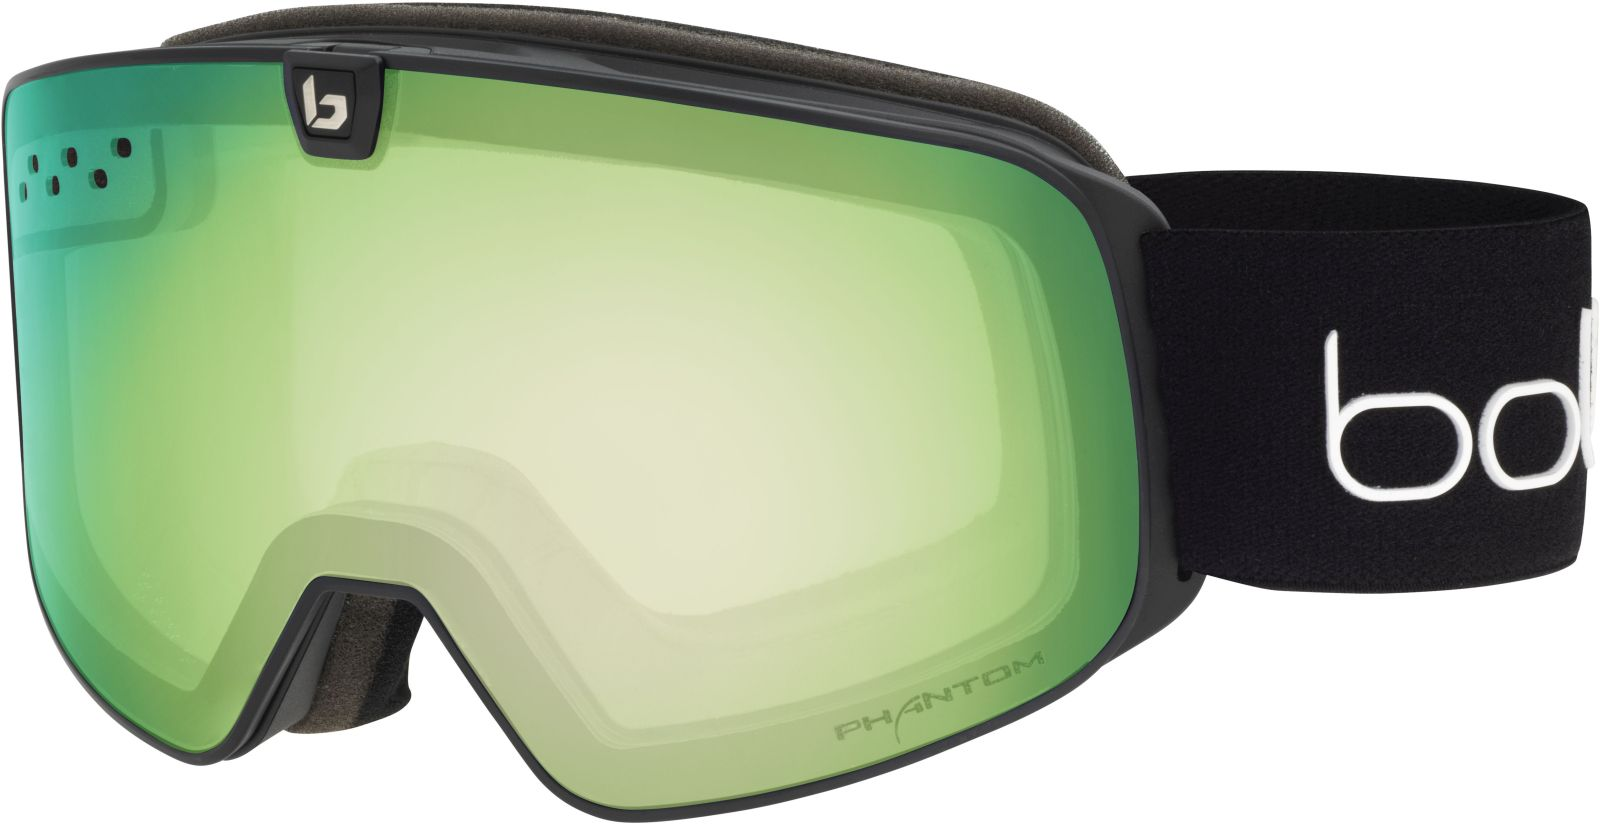 Bollé Nevada Neo - Black Matte / Phantom Green Emerald & Lemon uni